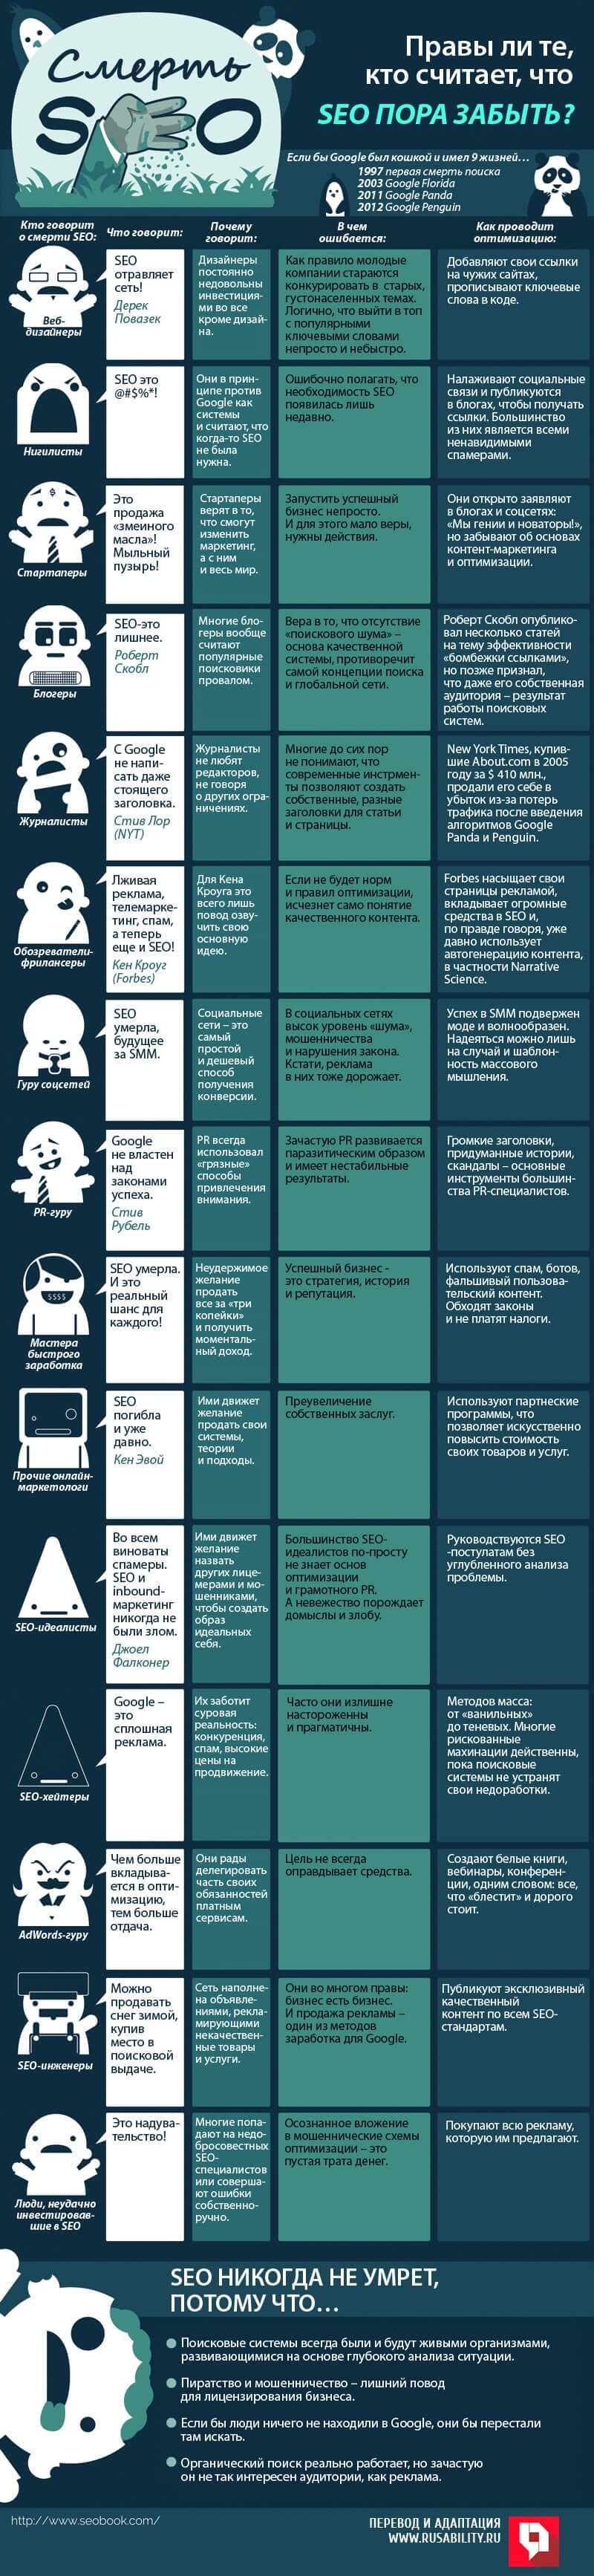 SEO, Google, оптимизация, поиск, алгоритмы, SEM, маркетинг, инфографика